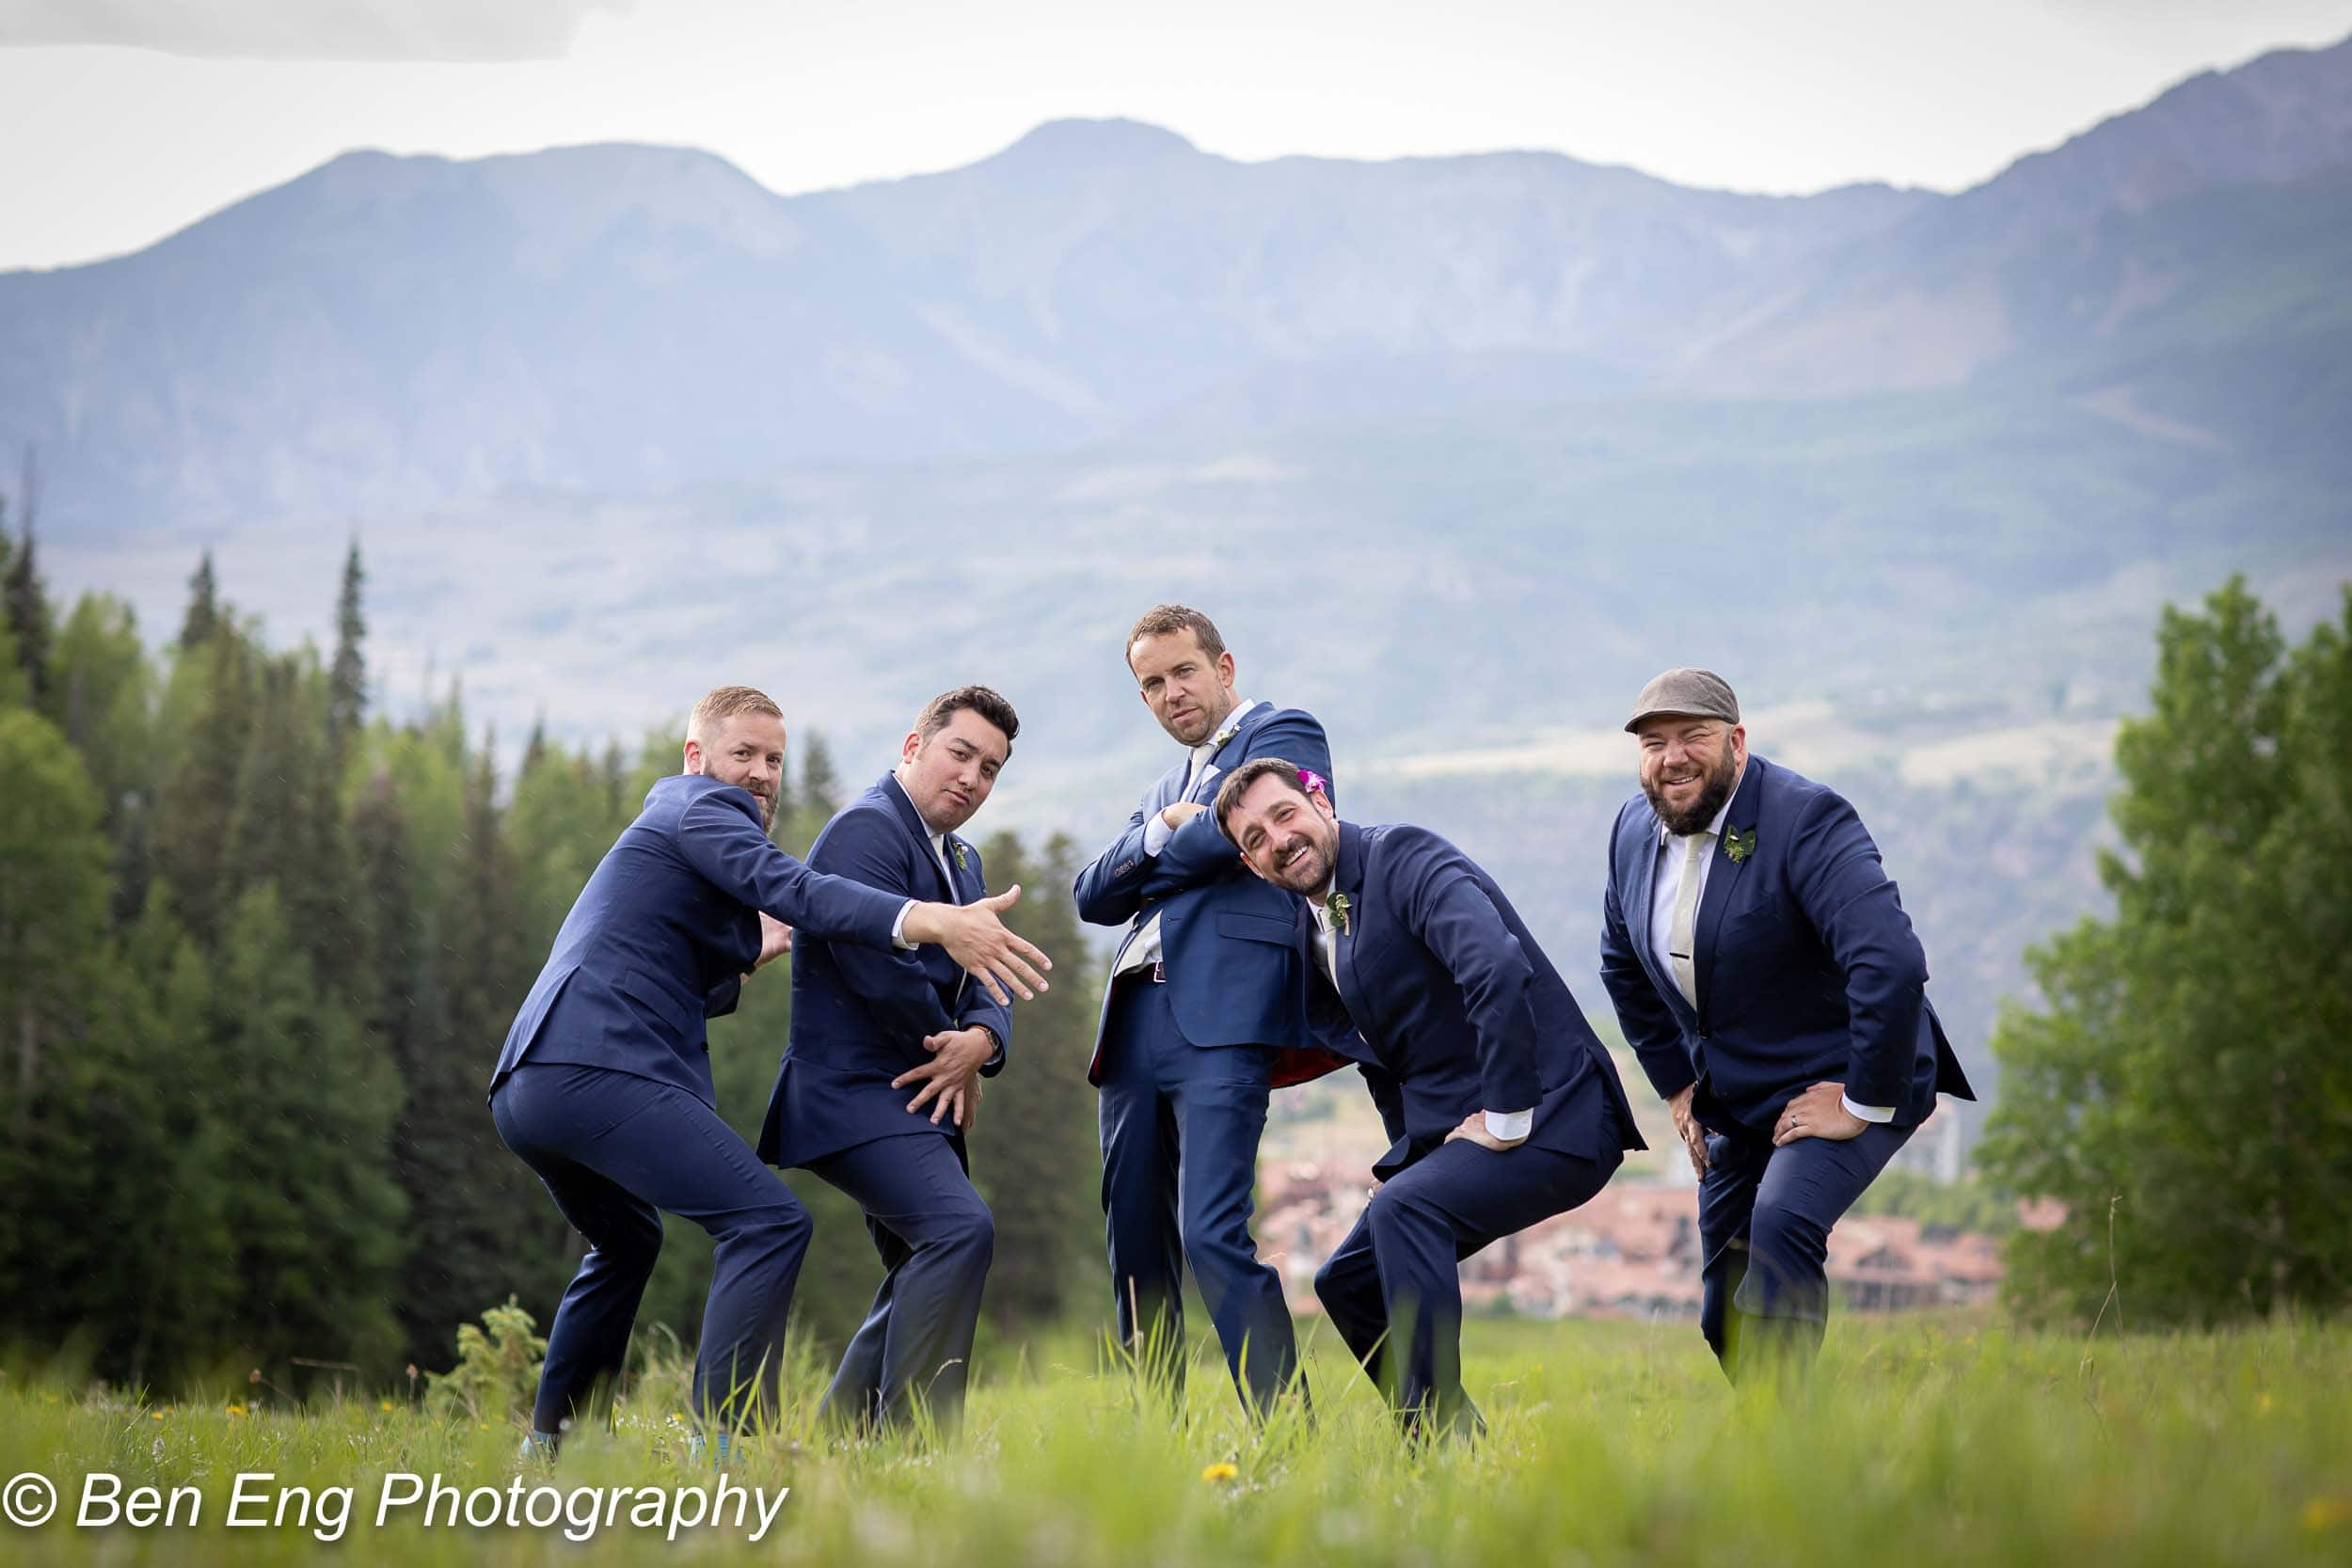 The groomsmen hamming it up